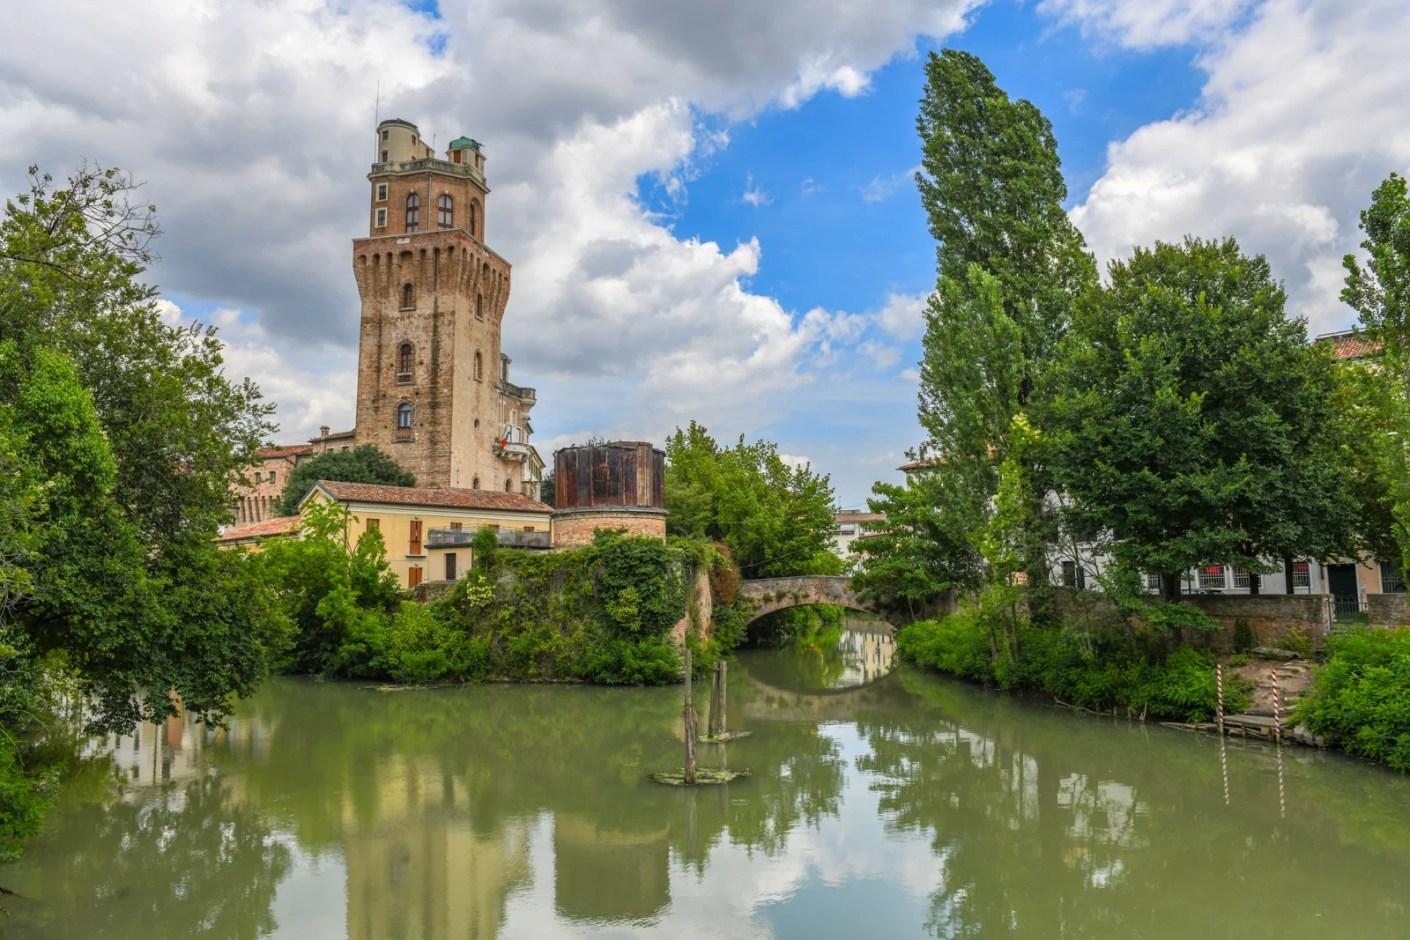 Museum La Specola. (Photo by Bobica10 / Shutterstock)